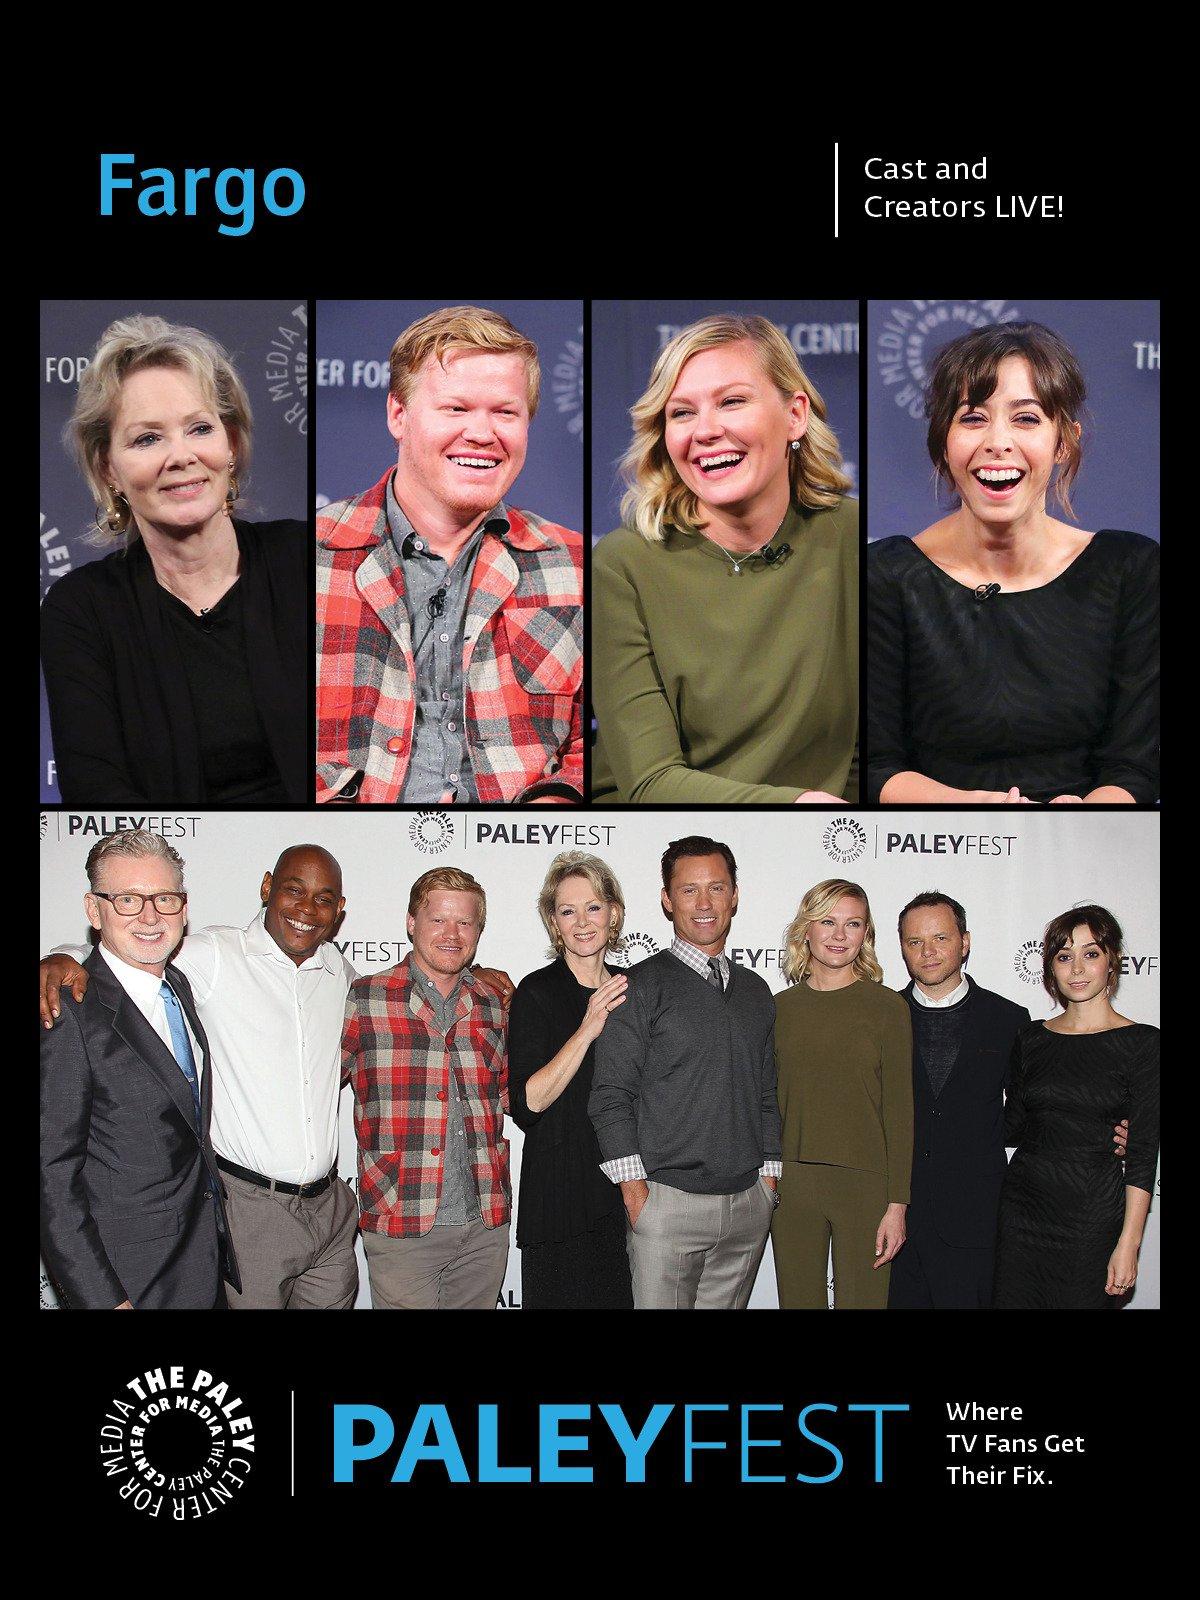 Fargo: Cast and Creators PaleyFest on Amazon Prime Video UK